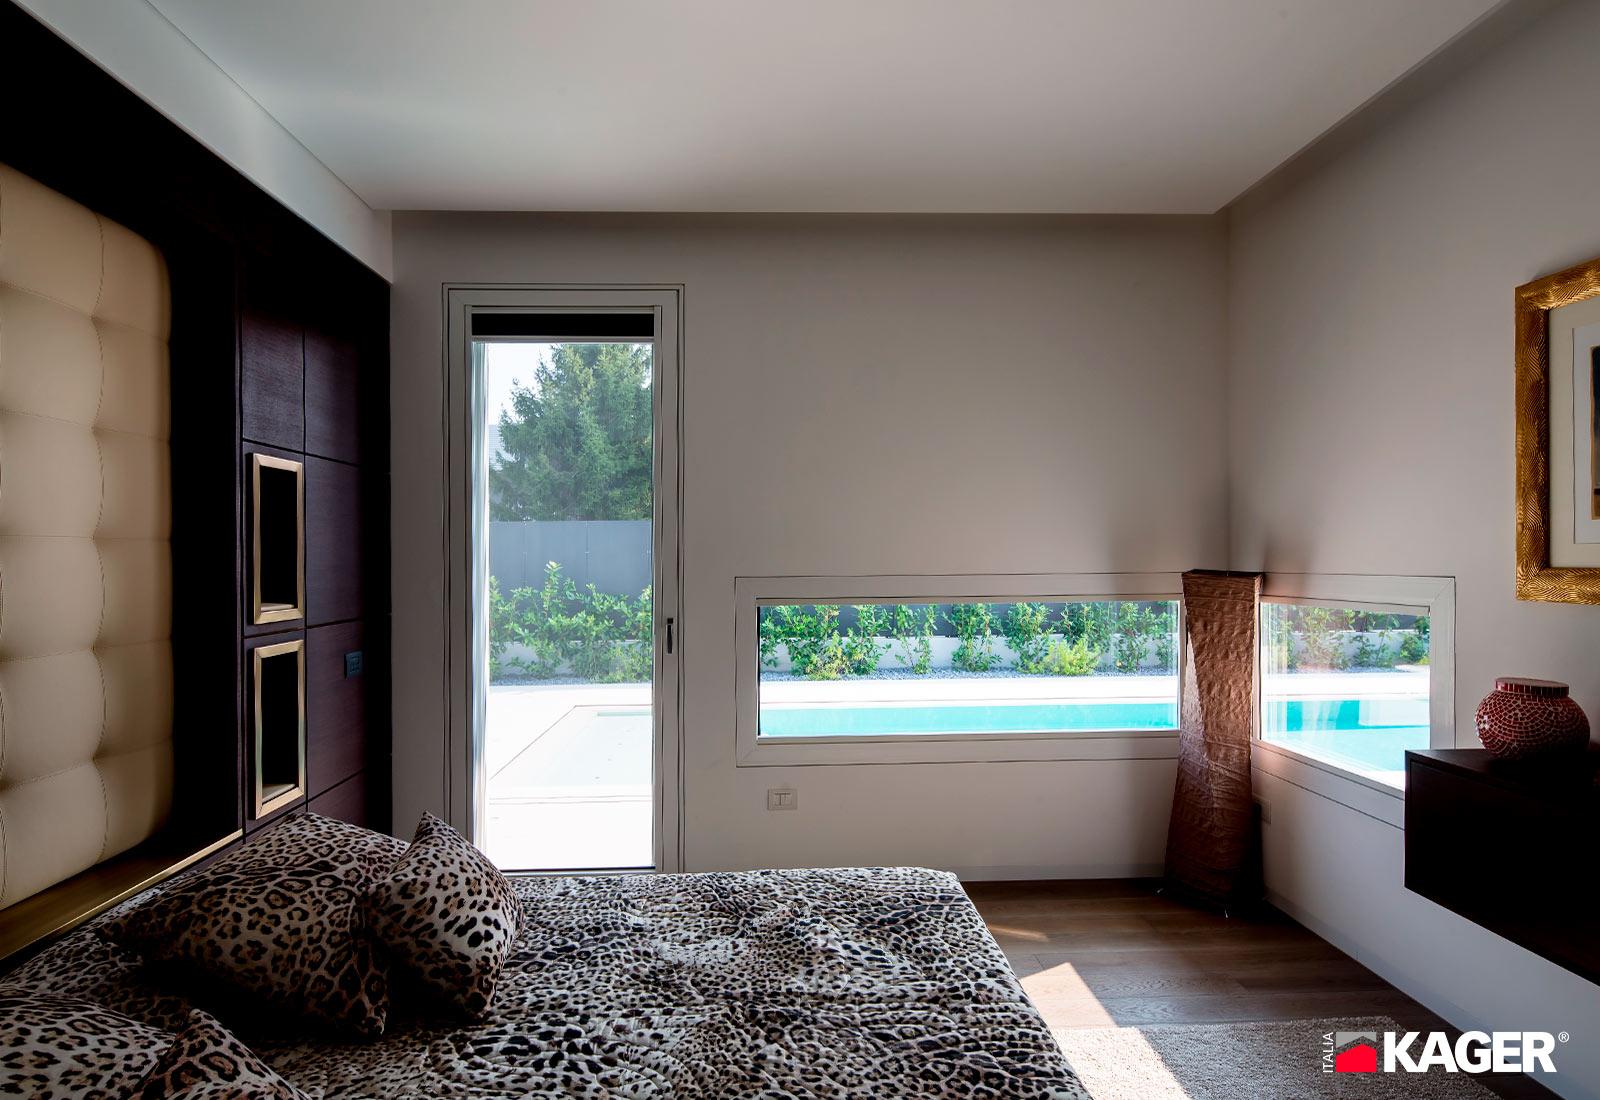 Casa-in-legno-Oppeano-Verona-Kager-Italia-13